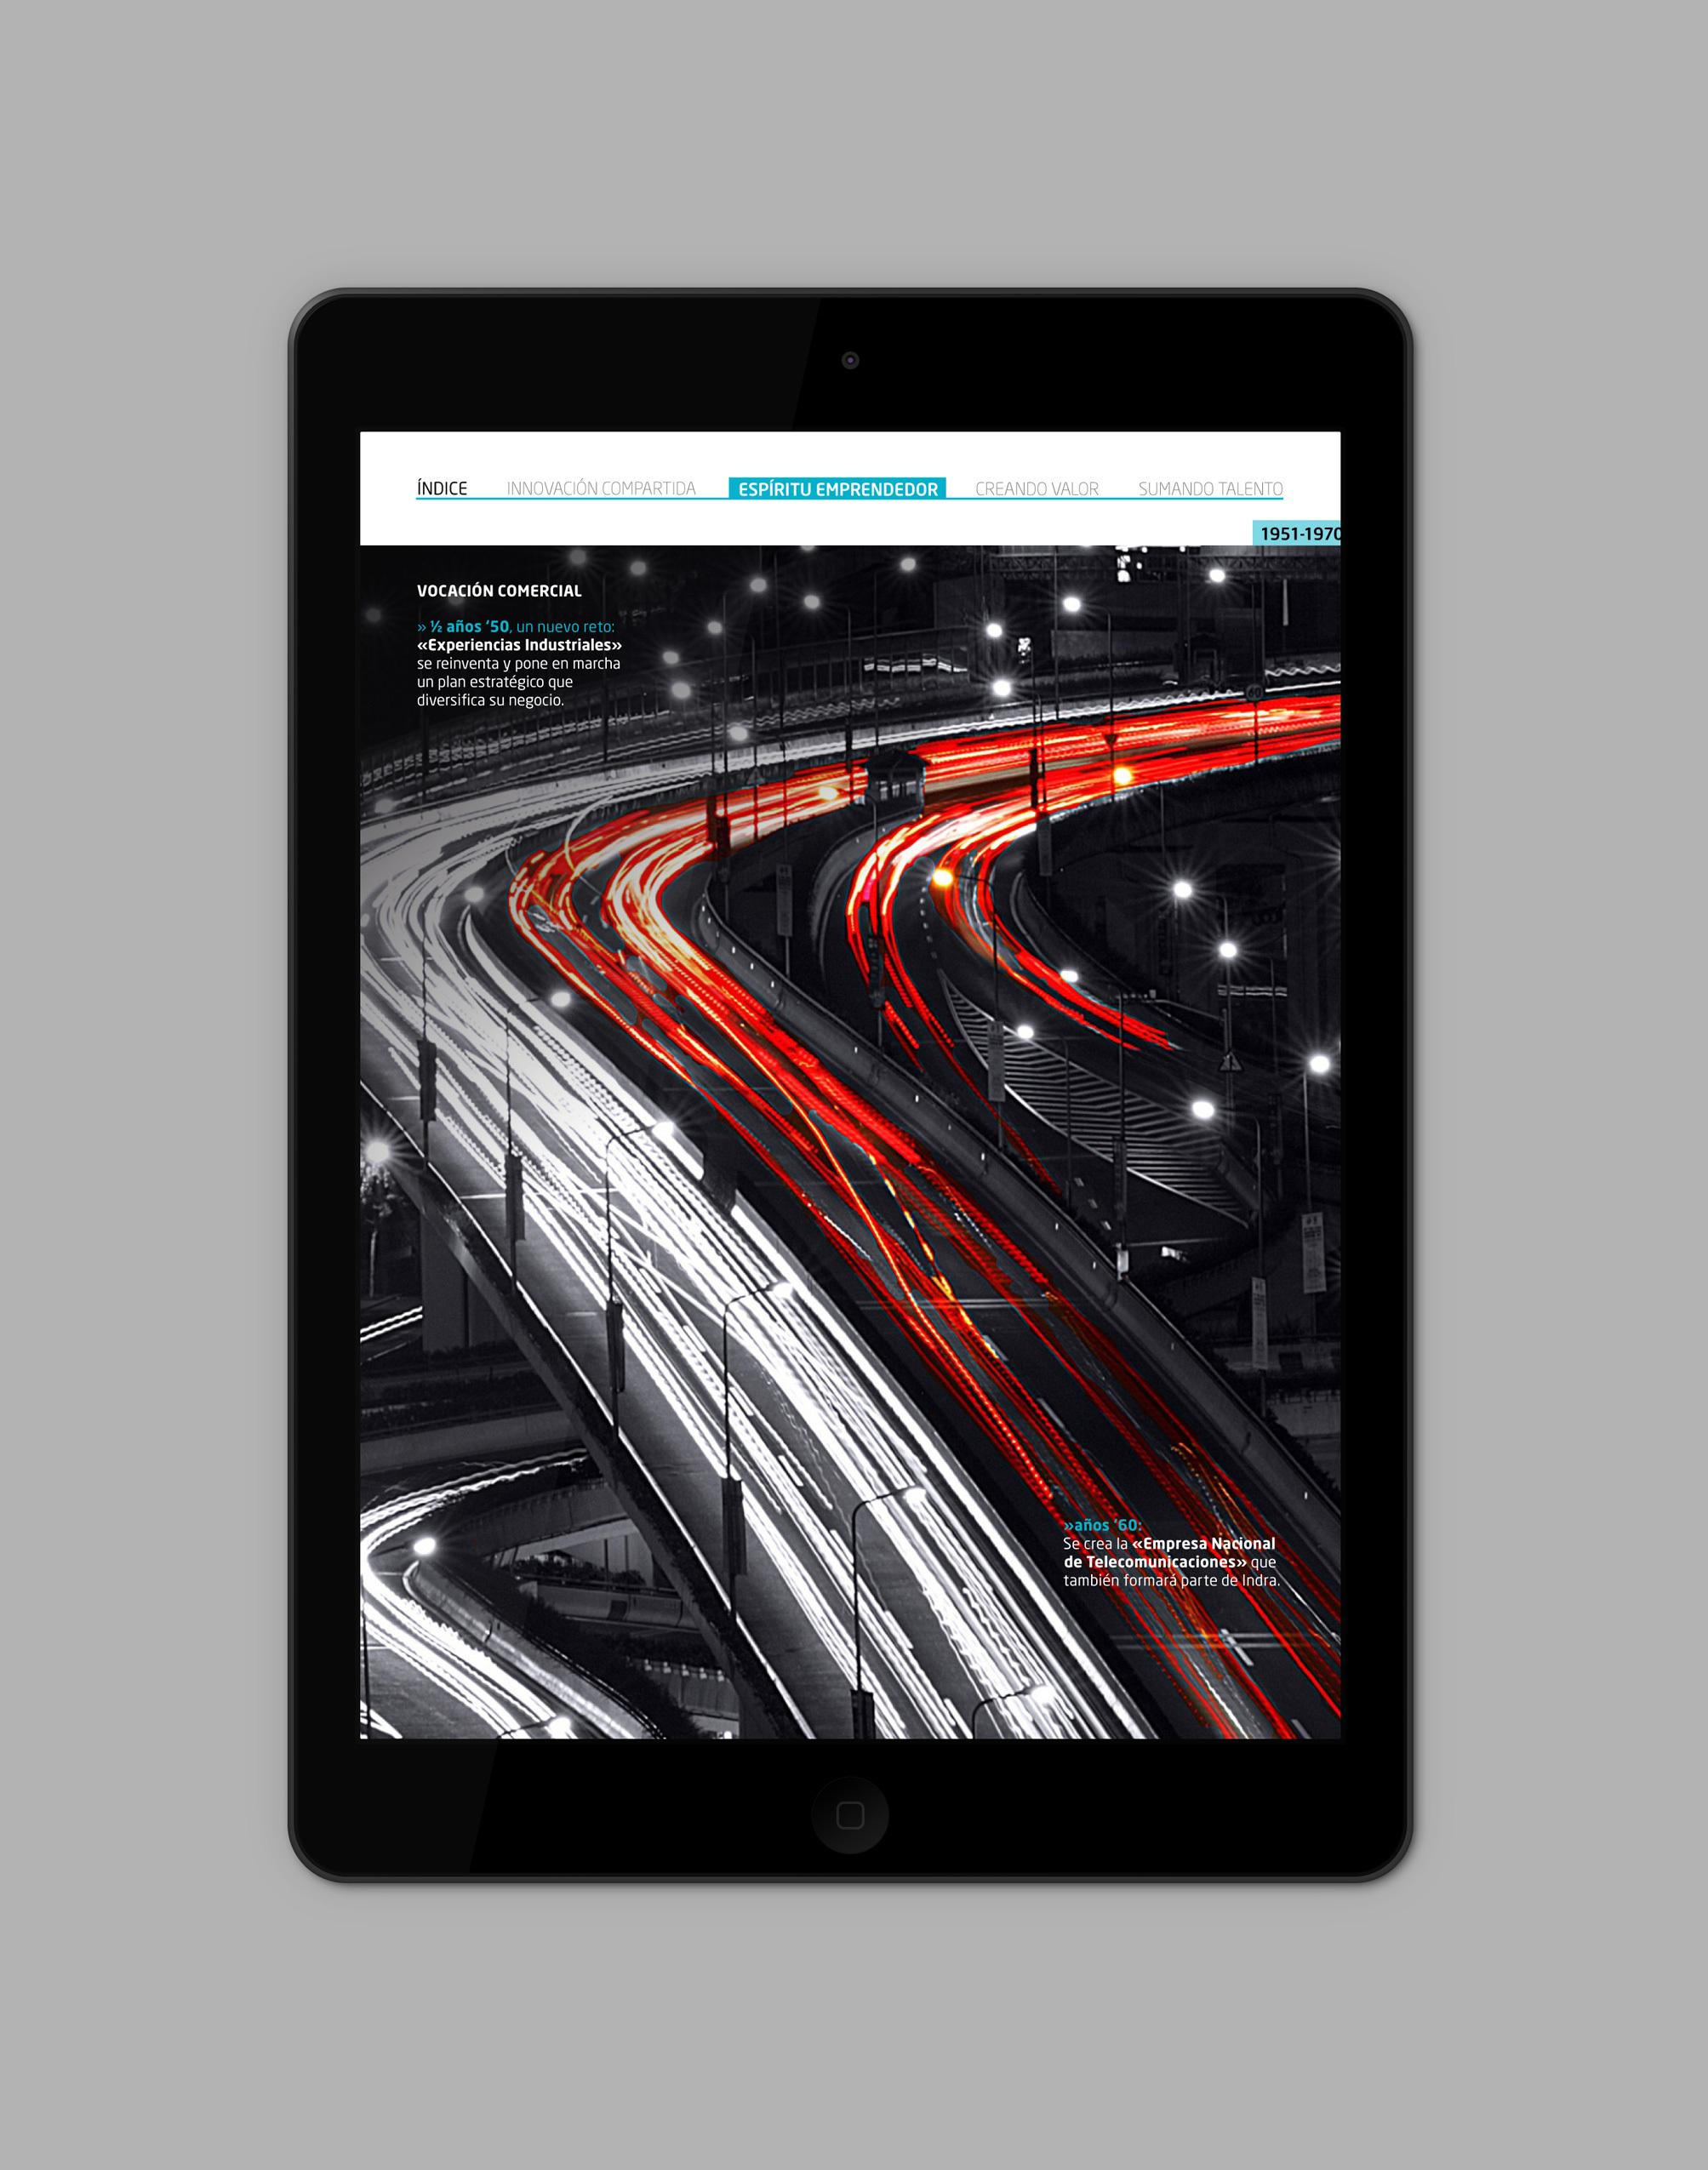 iPad-Air_Indra11.jpg